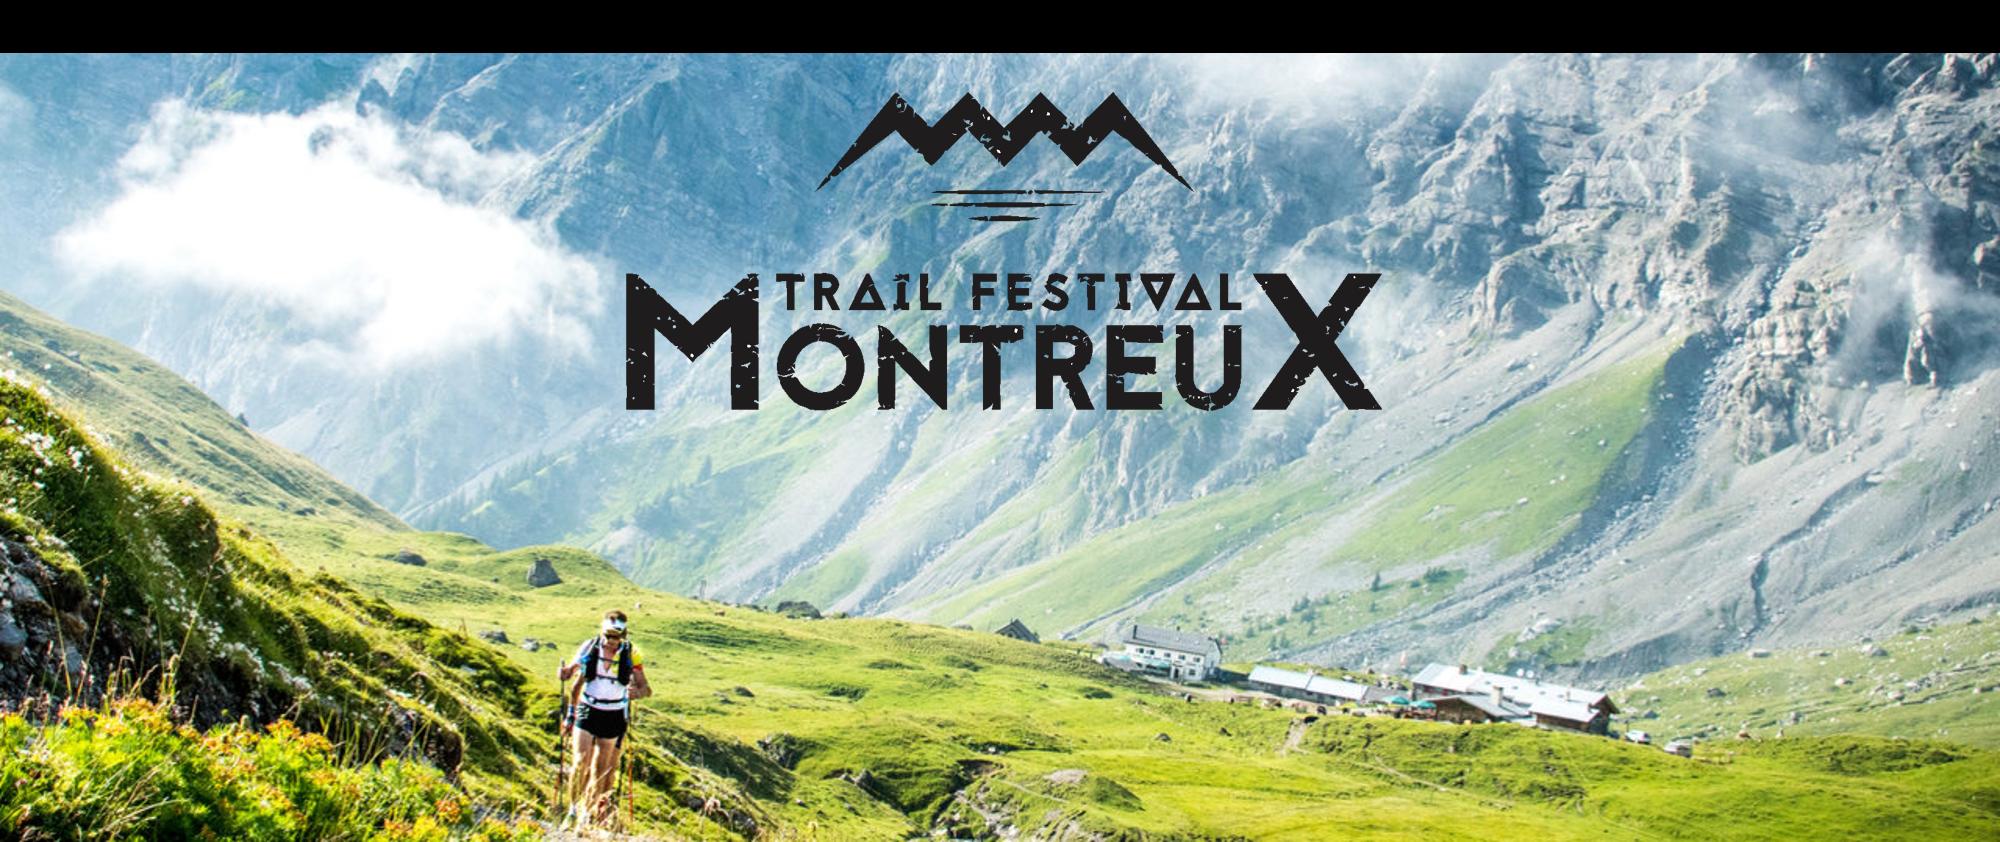 Carlos Sá e Hélio Fumo confirmados no Montreux Trail Festival